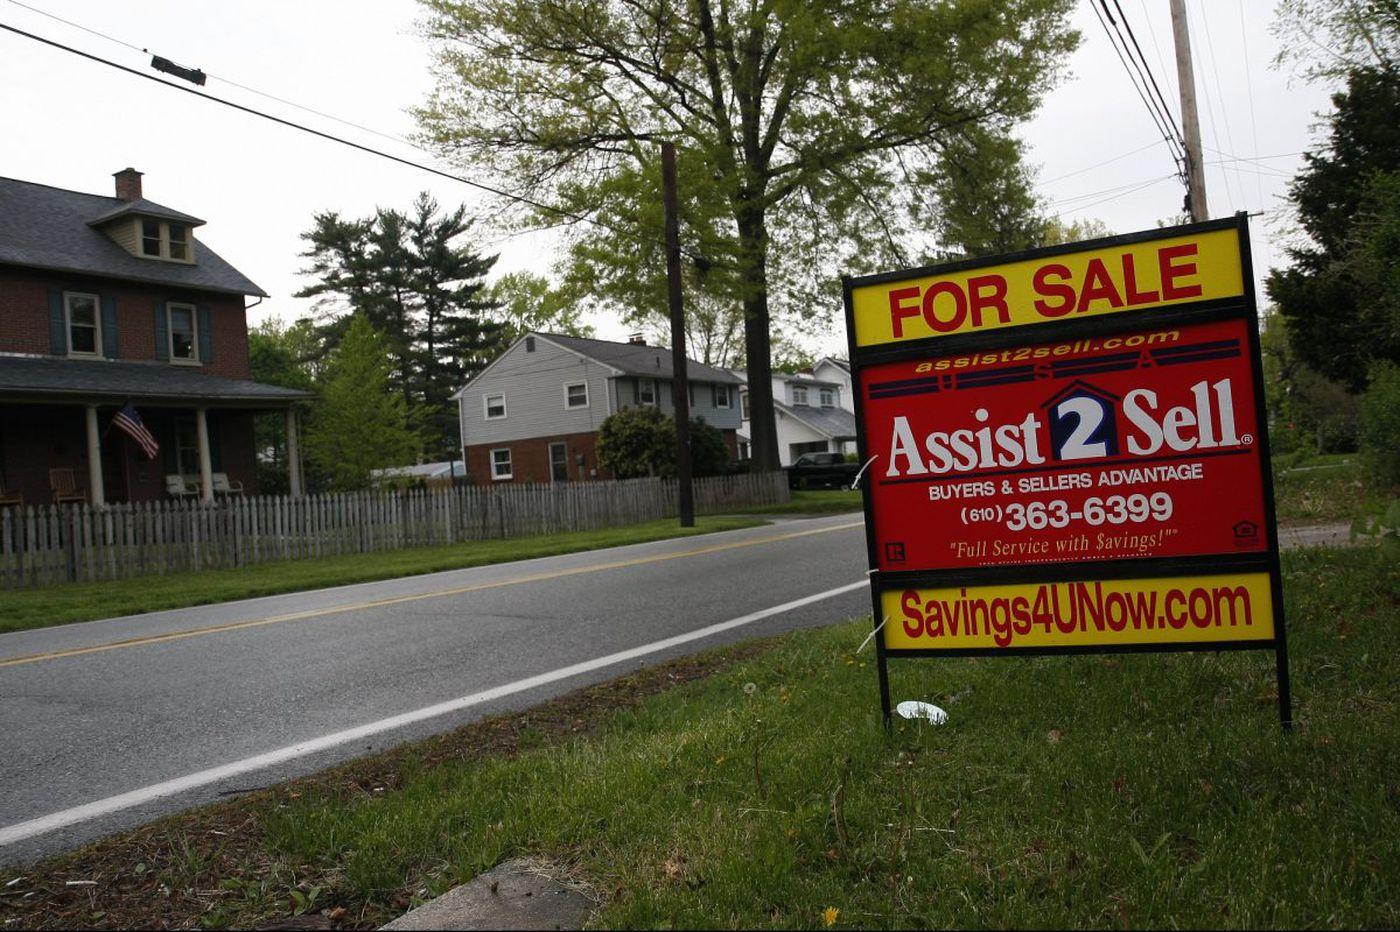 Million-dollar homes in West Philly? A new hot neighborhood? The latest on Philadelphia's housing market